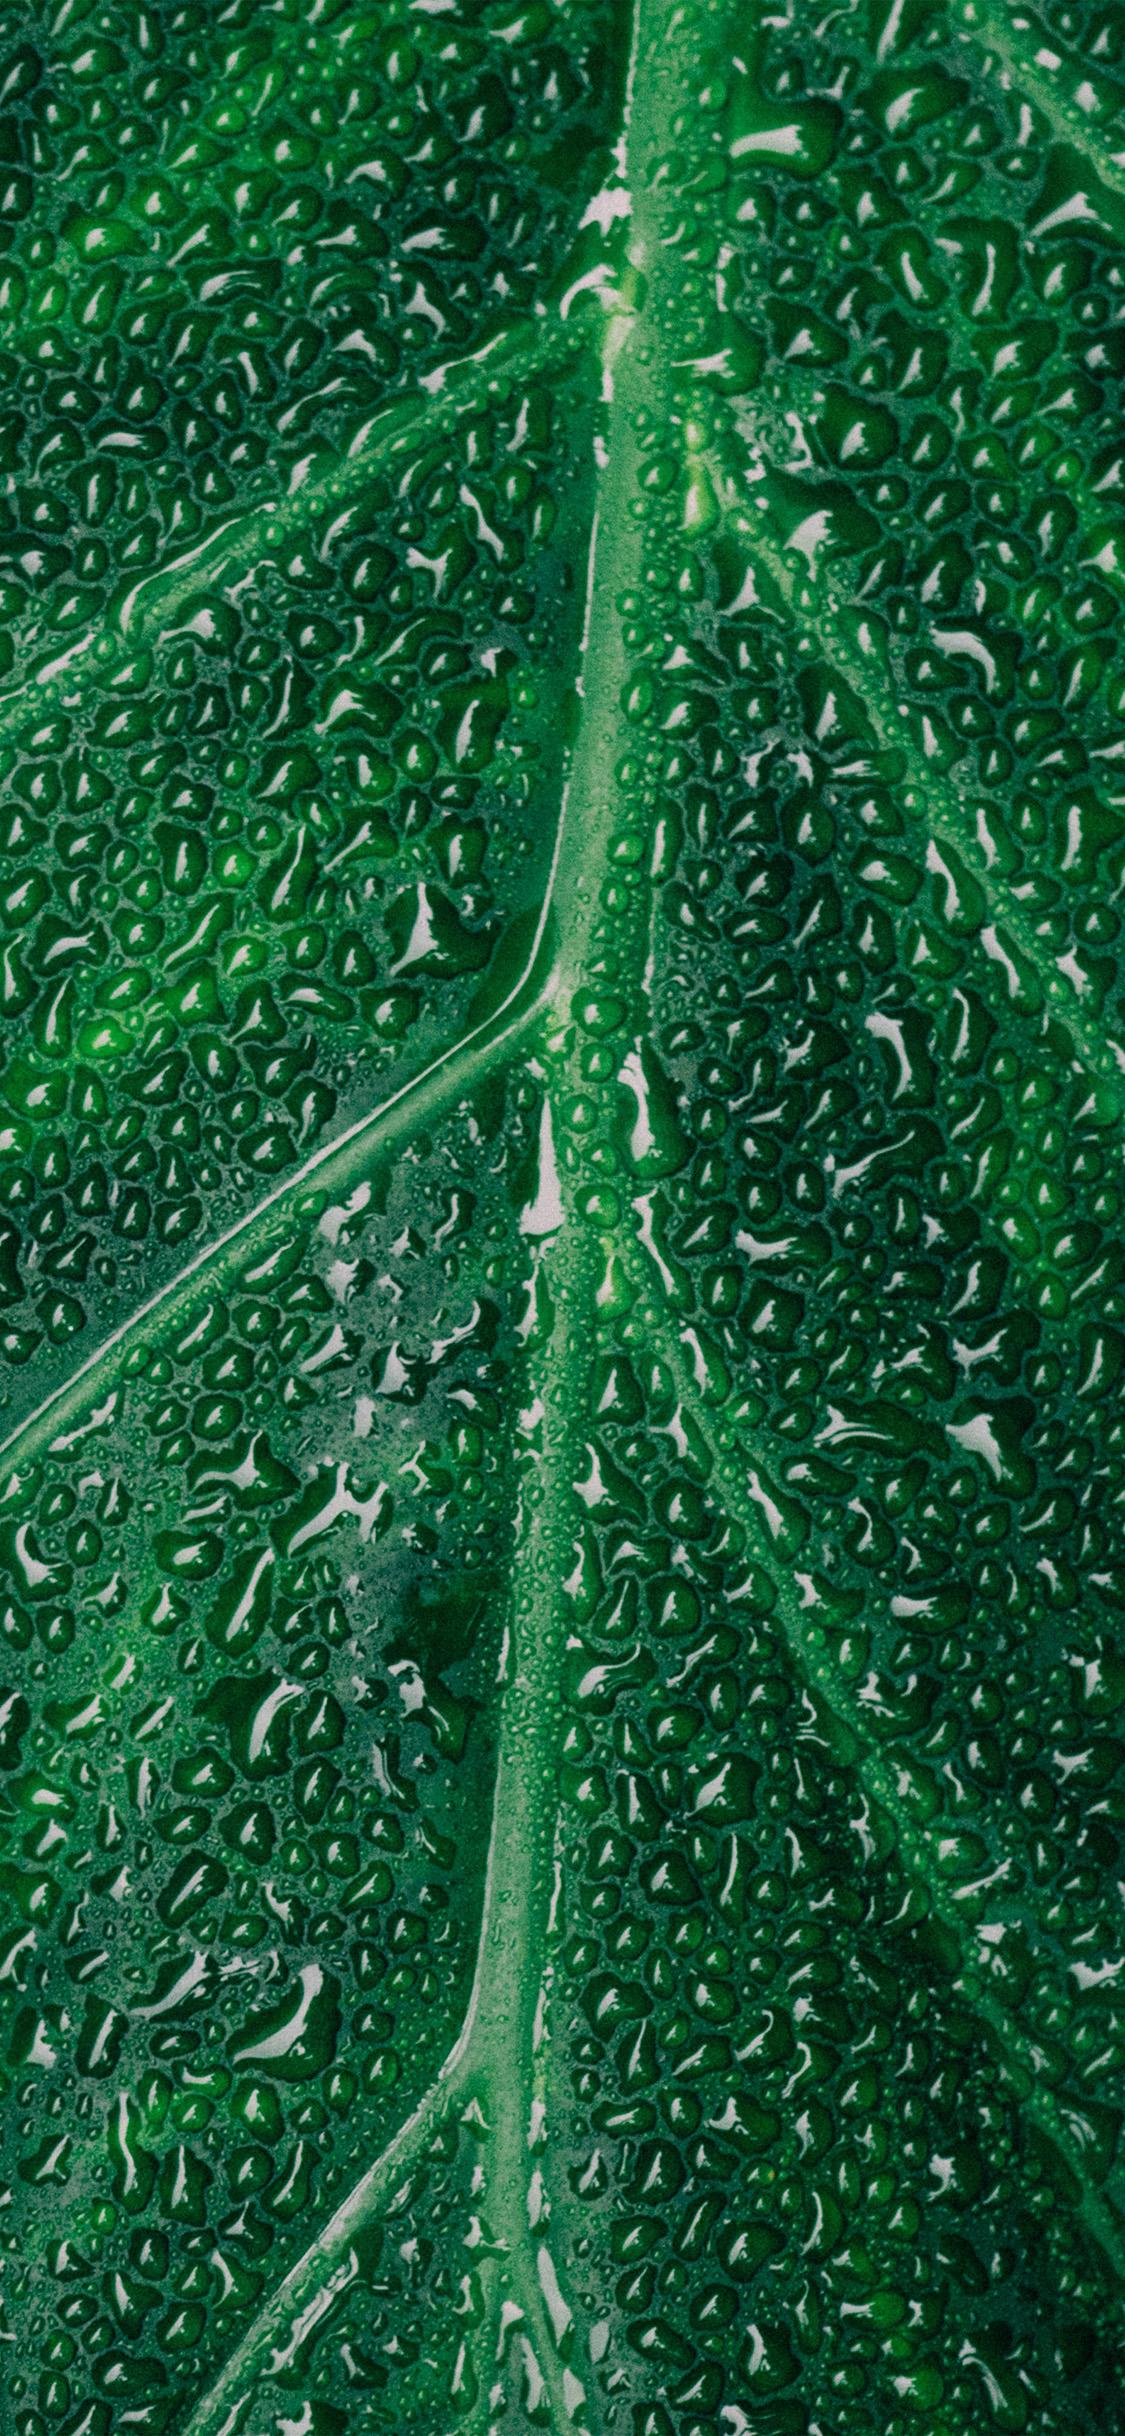 iPhonexpapers.com-Apple-iPhone-wallpaper-nz30-leaf-rain-green-nature